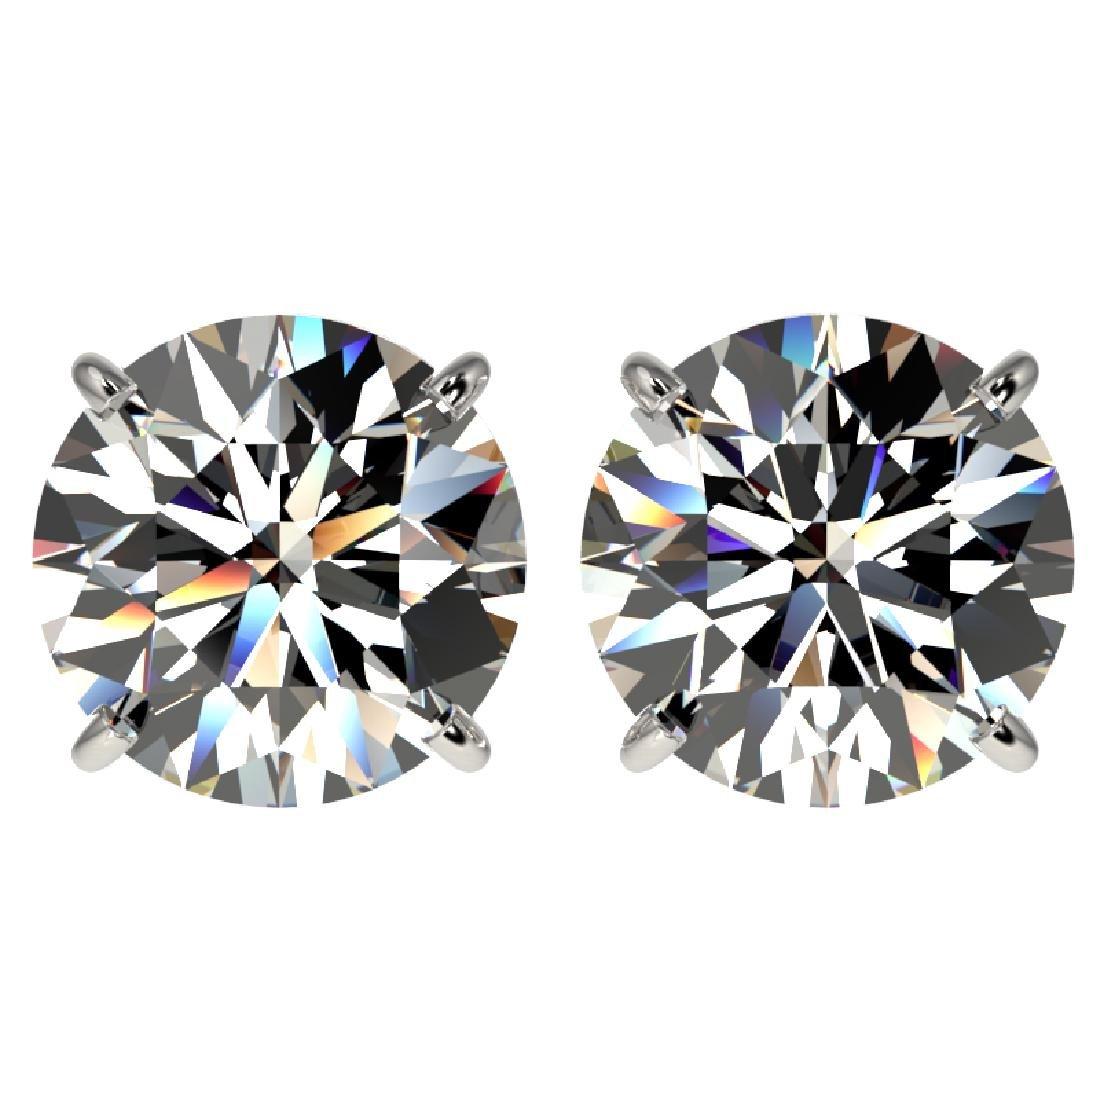 4.04 CTW Certified G-Si Quality Diamond Stud Earrings